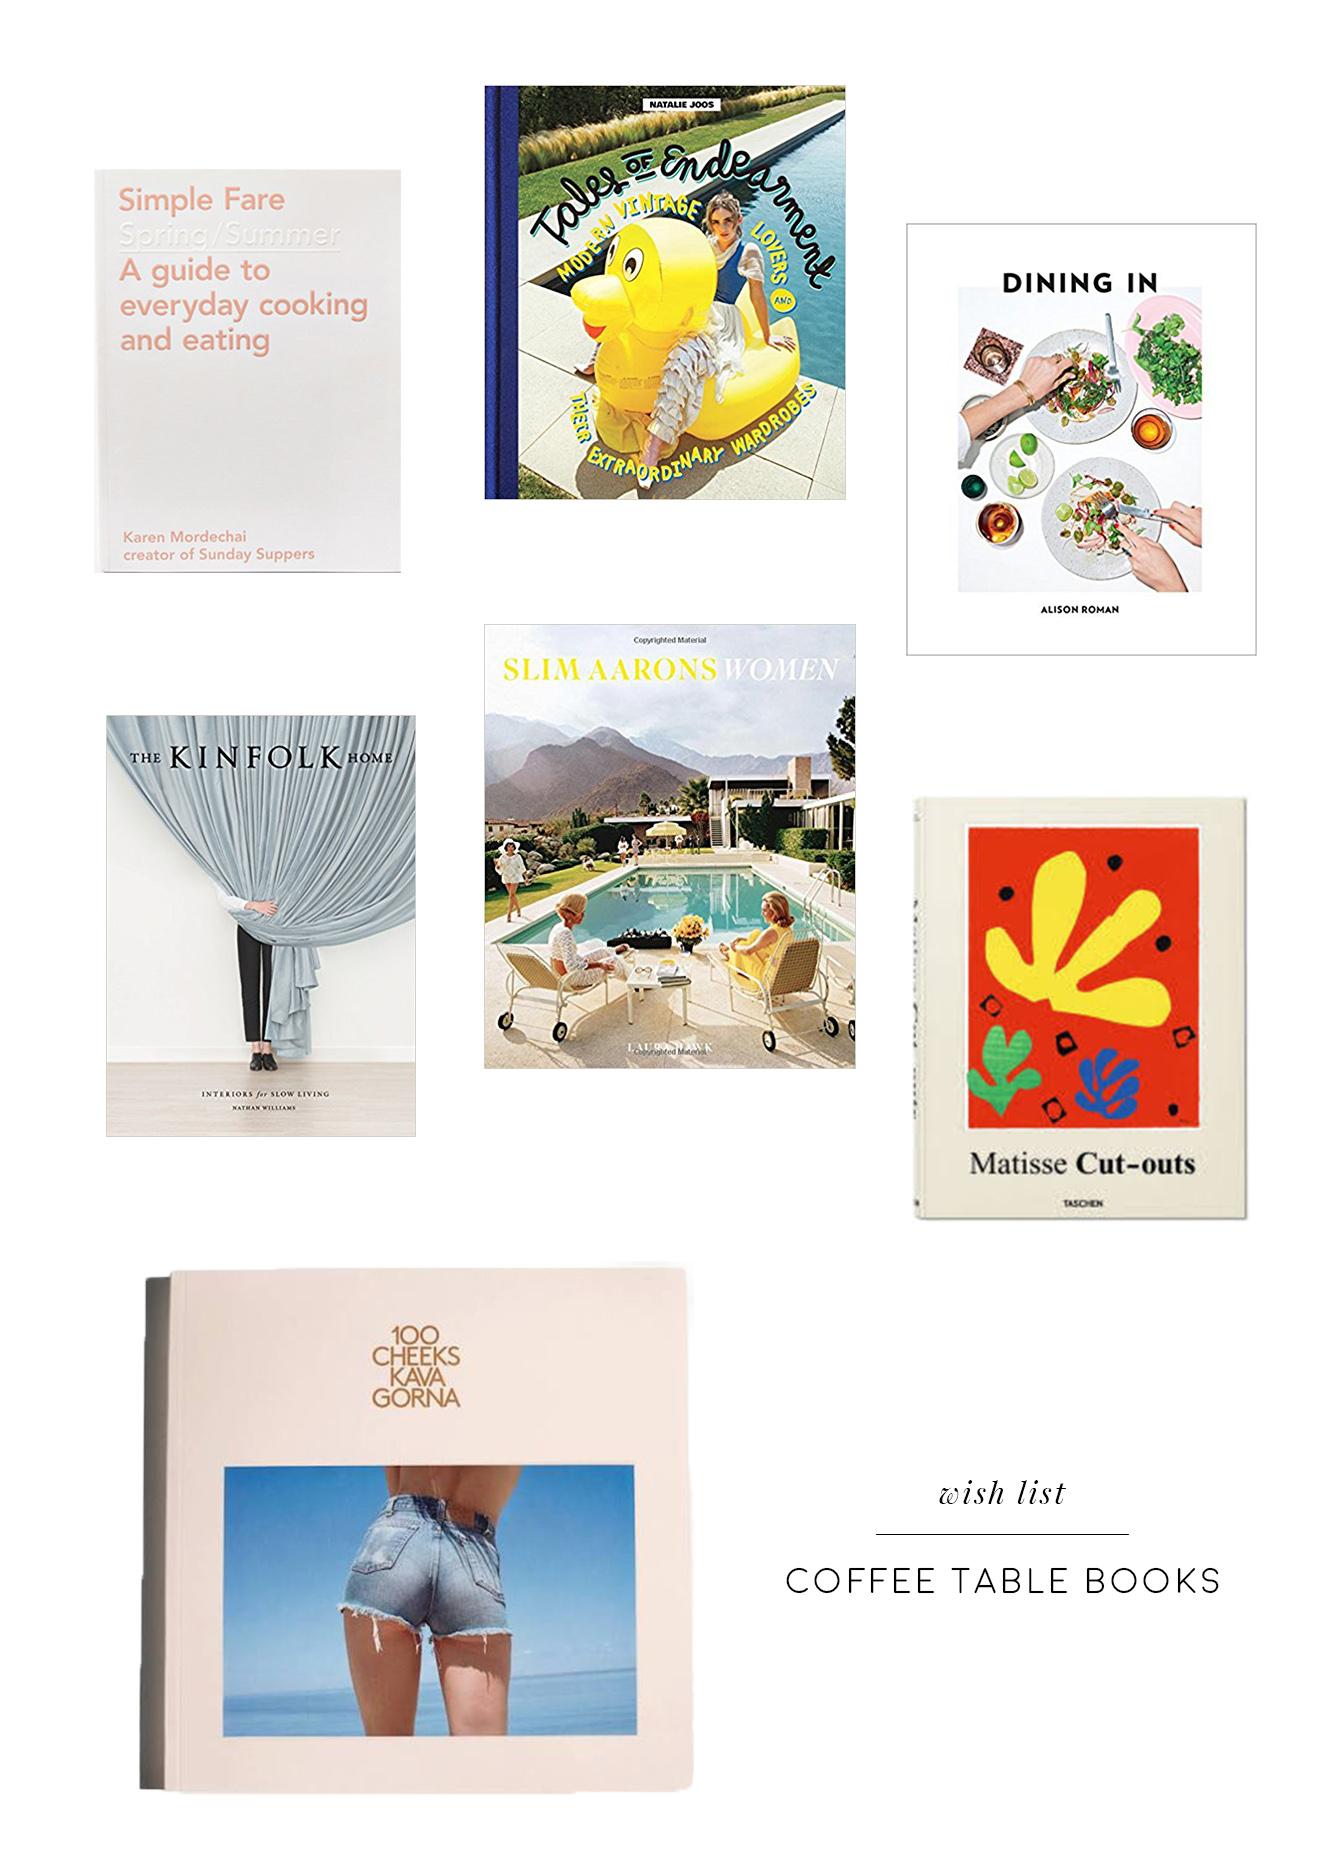 Coffee-table-books-gifts-wishlist-christmas-giving-big-books-art-design